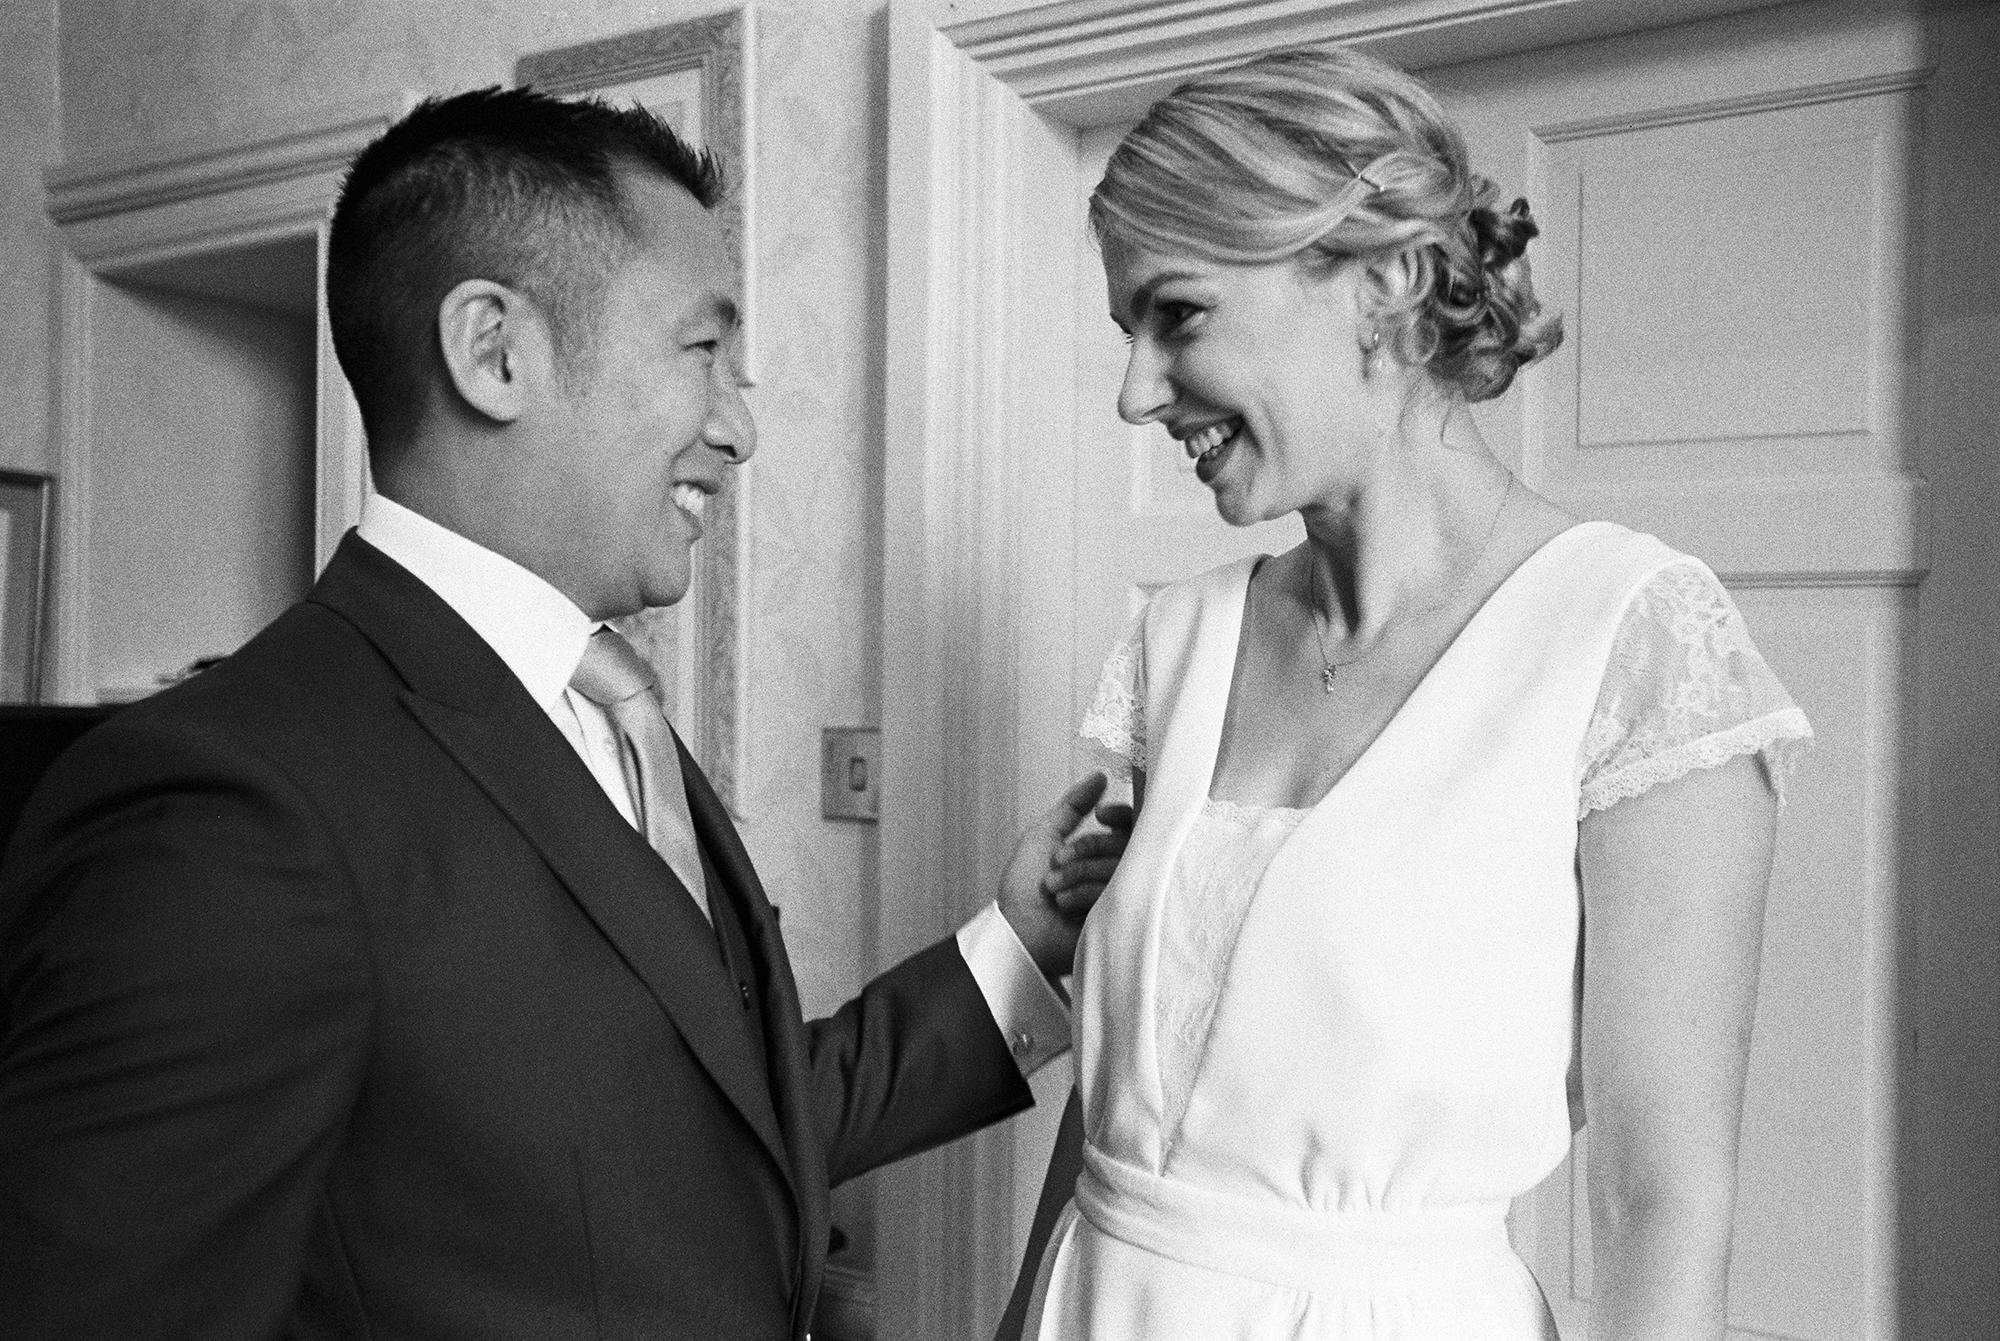 wedding_photographer_cumbria021.jpg